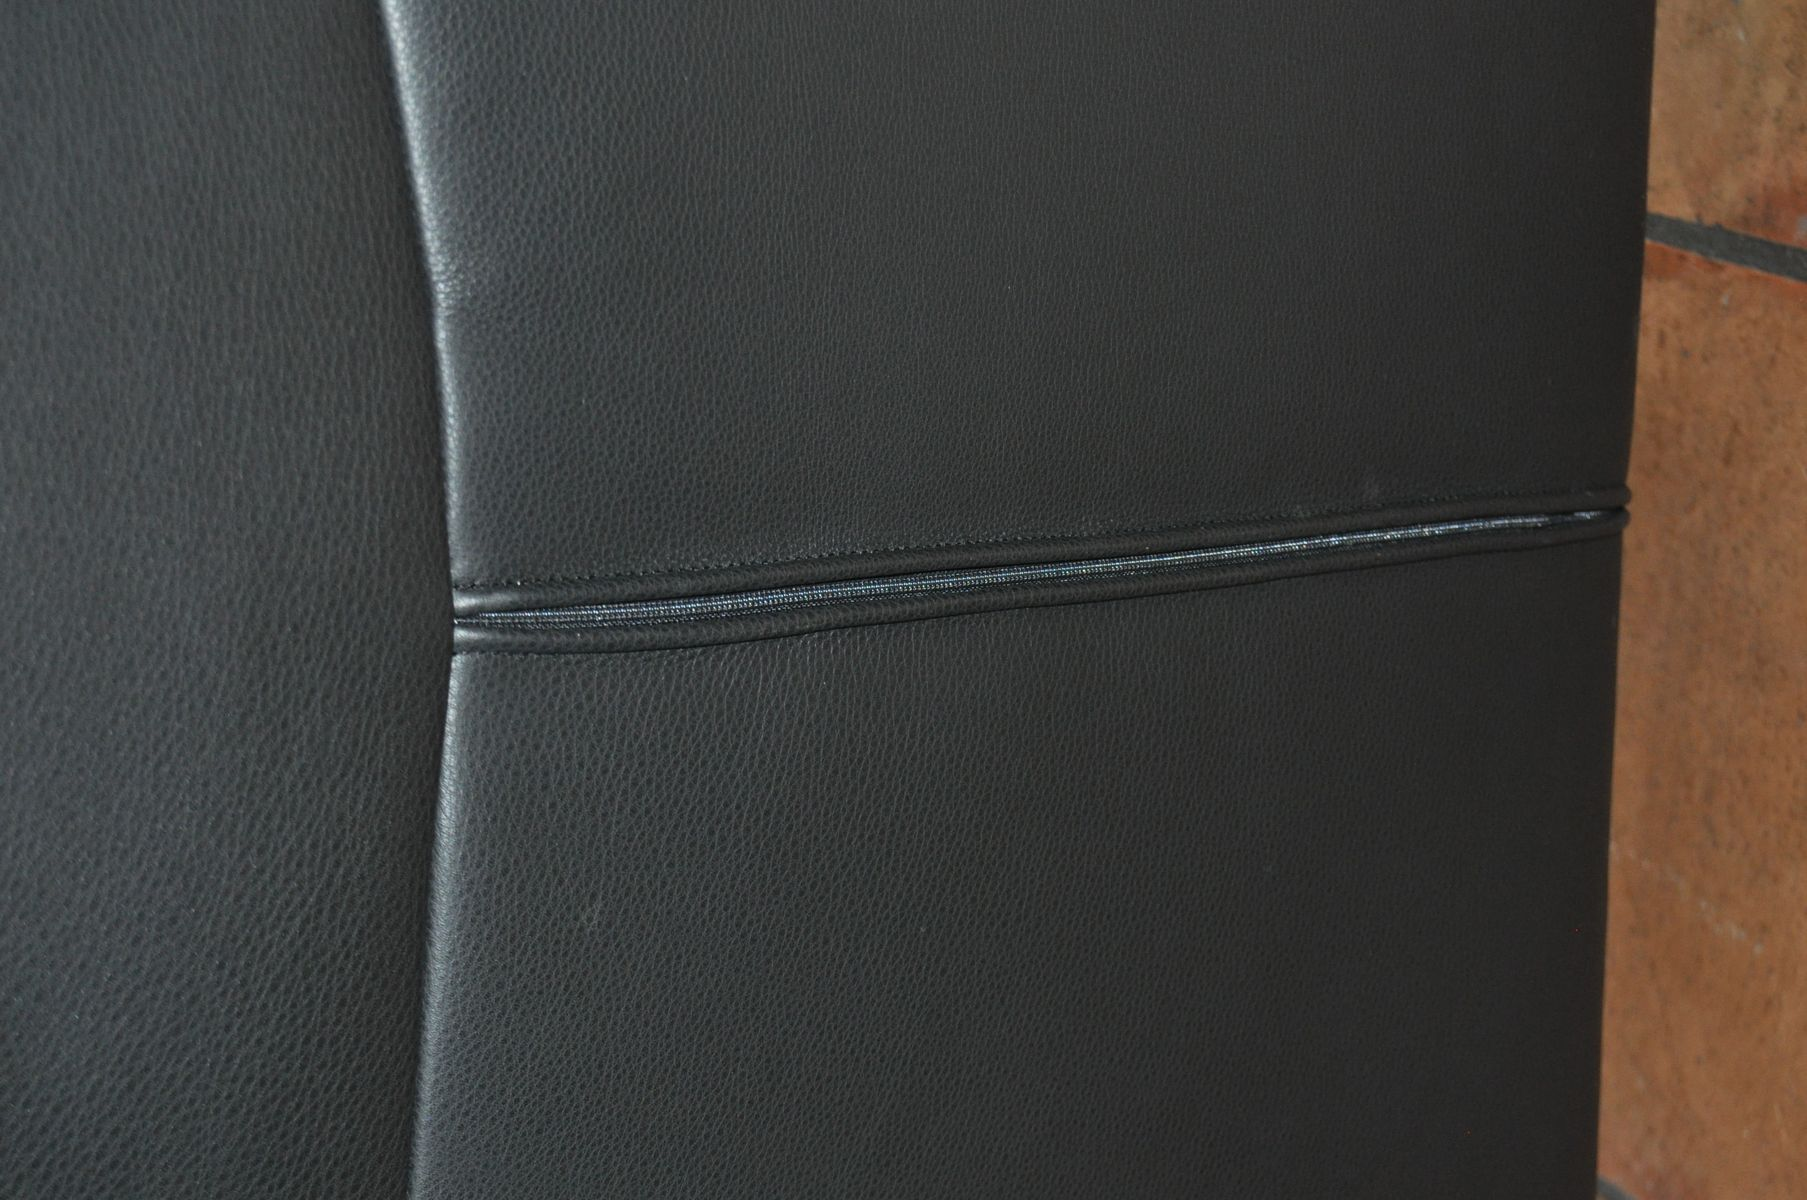 schwarzes vintage ledersofa von de sede bei pamono kaufen. Black Bedroom Furniture Sets. Home Design Ideas